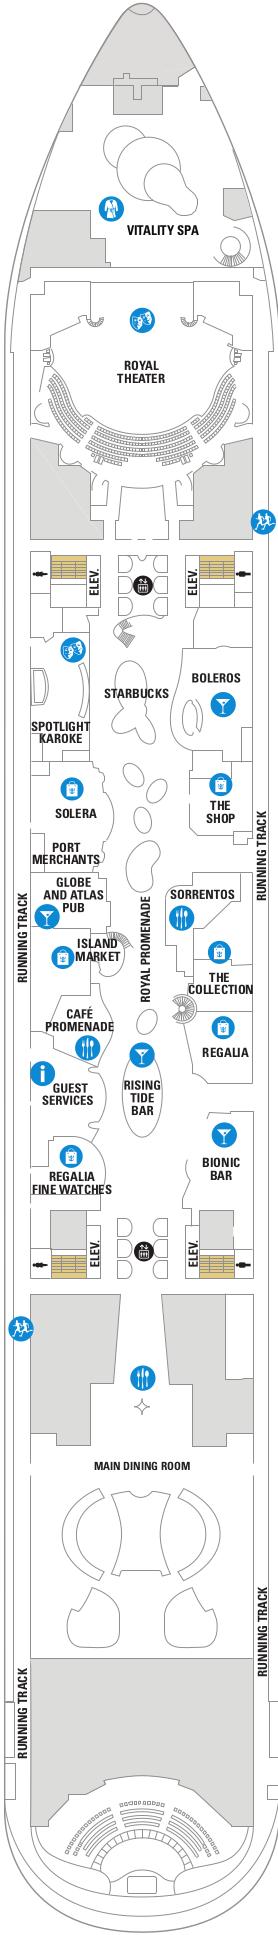 Oasis Of The Seas Deck 5 Deck Plan